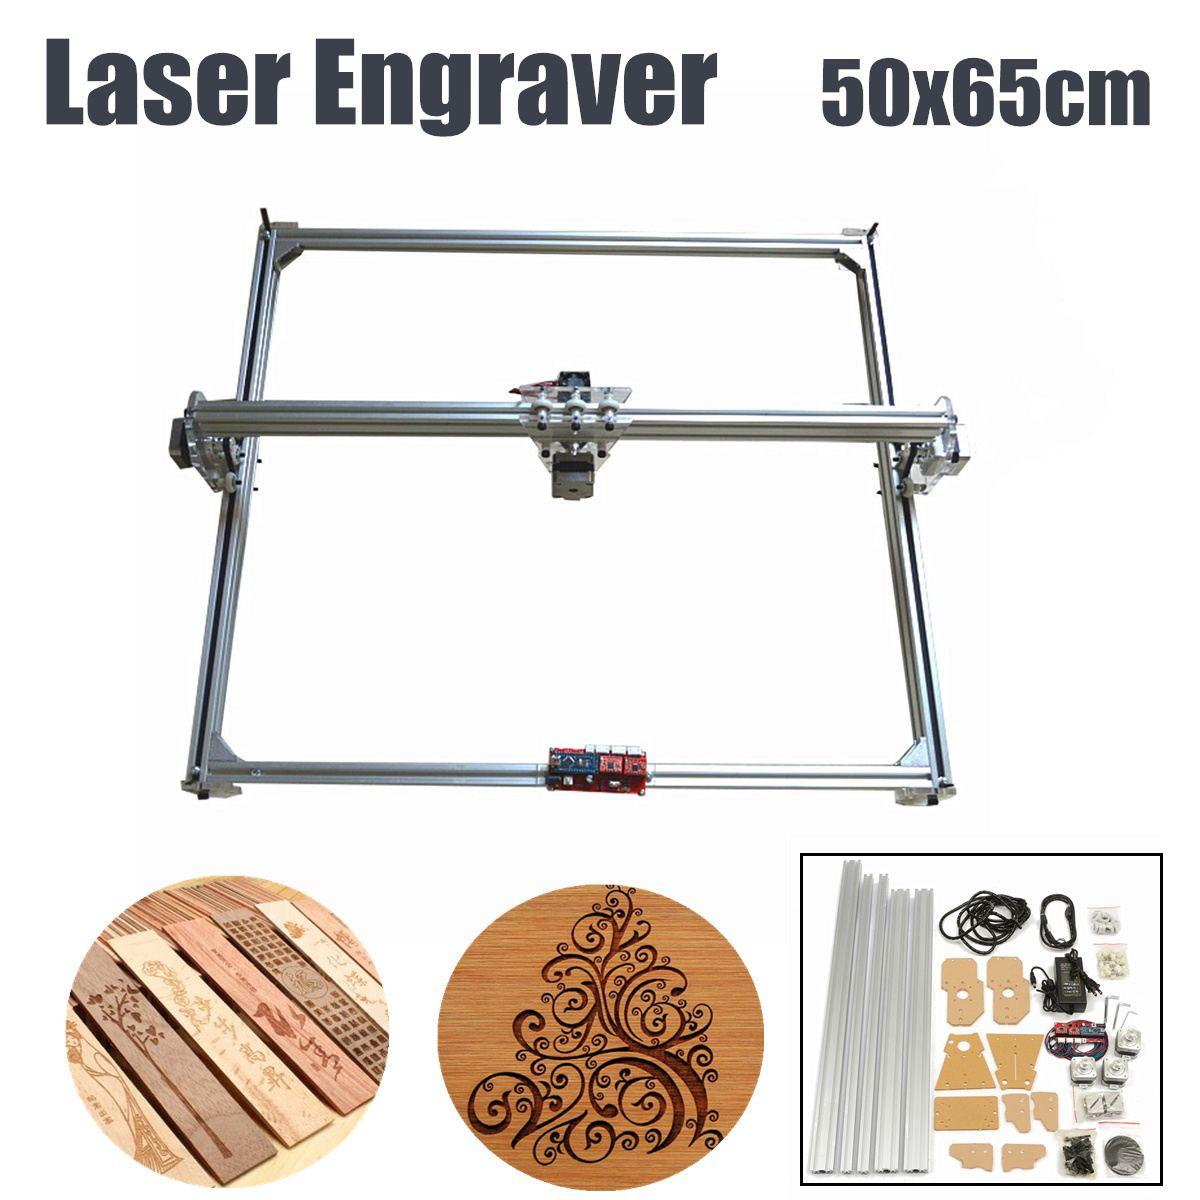 1Set 65x50cm 100mw 5500mw DIY Desktop Mini Laser Cutting/Engraving Engraver Machine DC 12V Wood Cutter/Printer/Power Adjustable